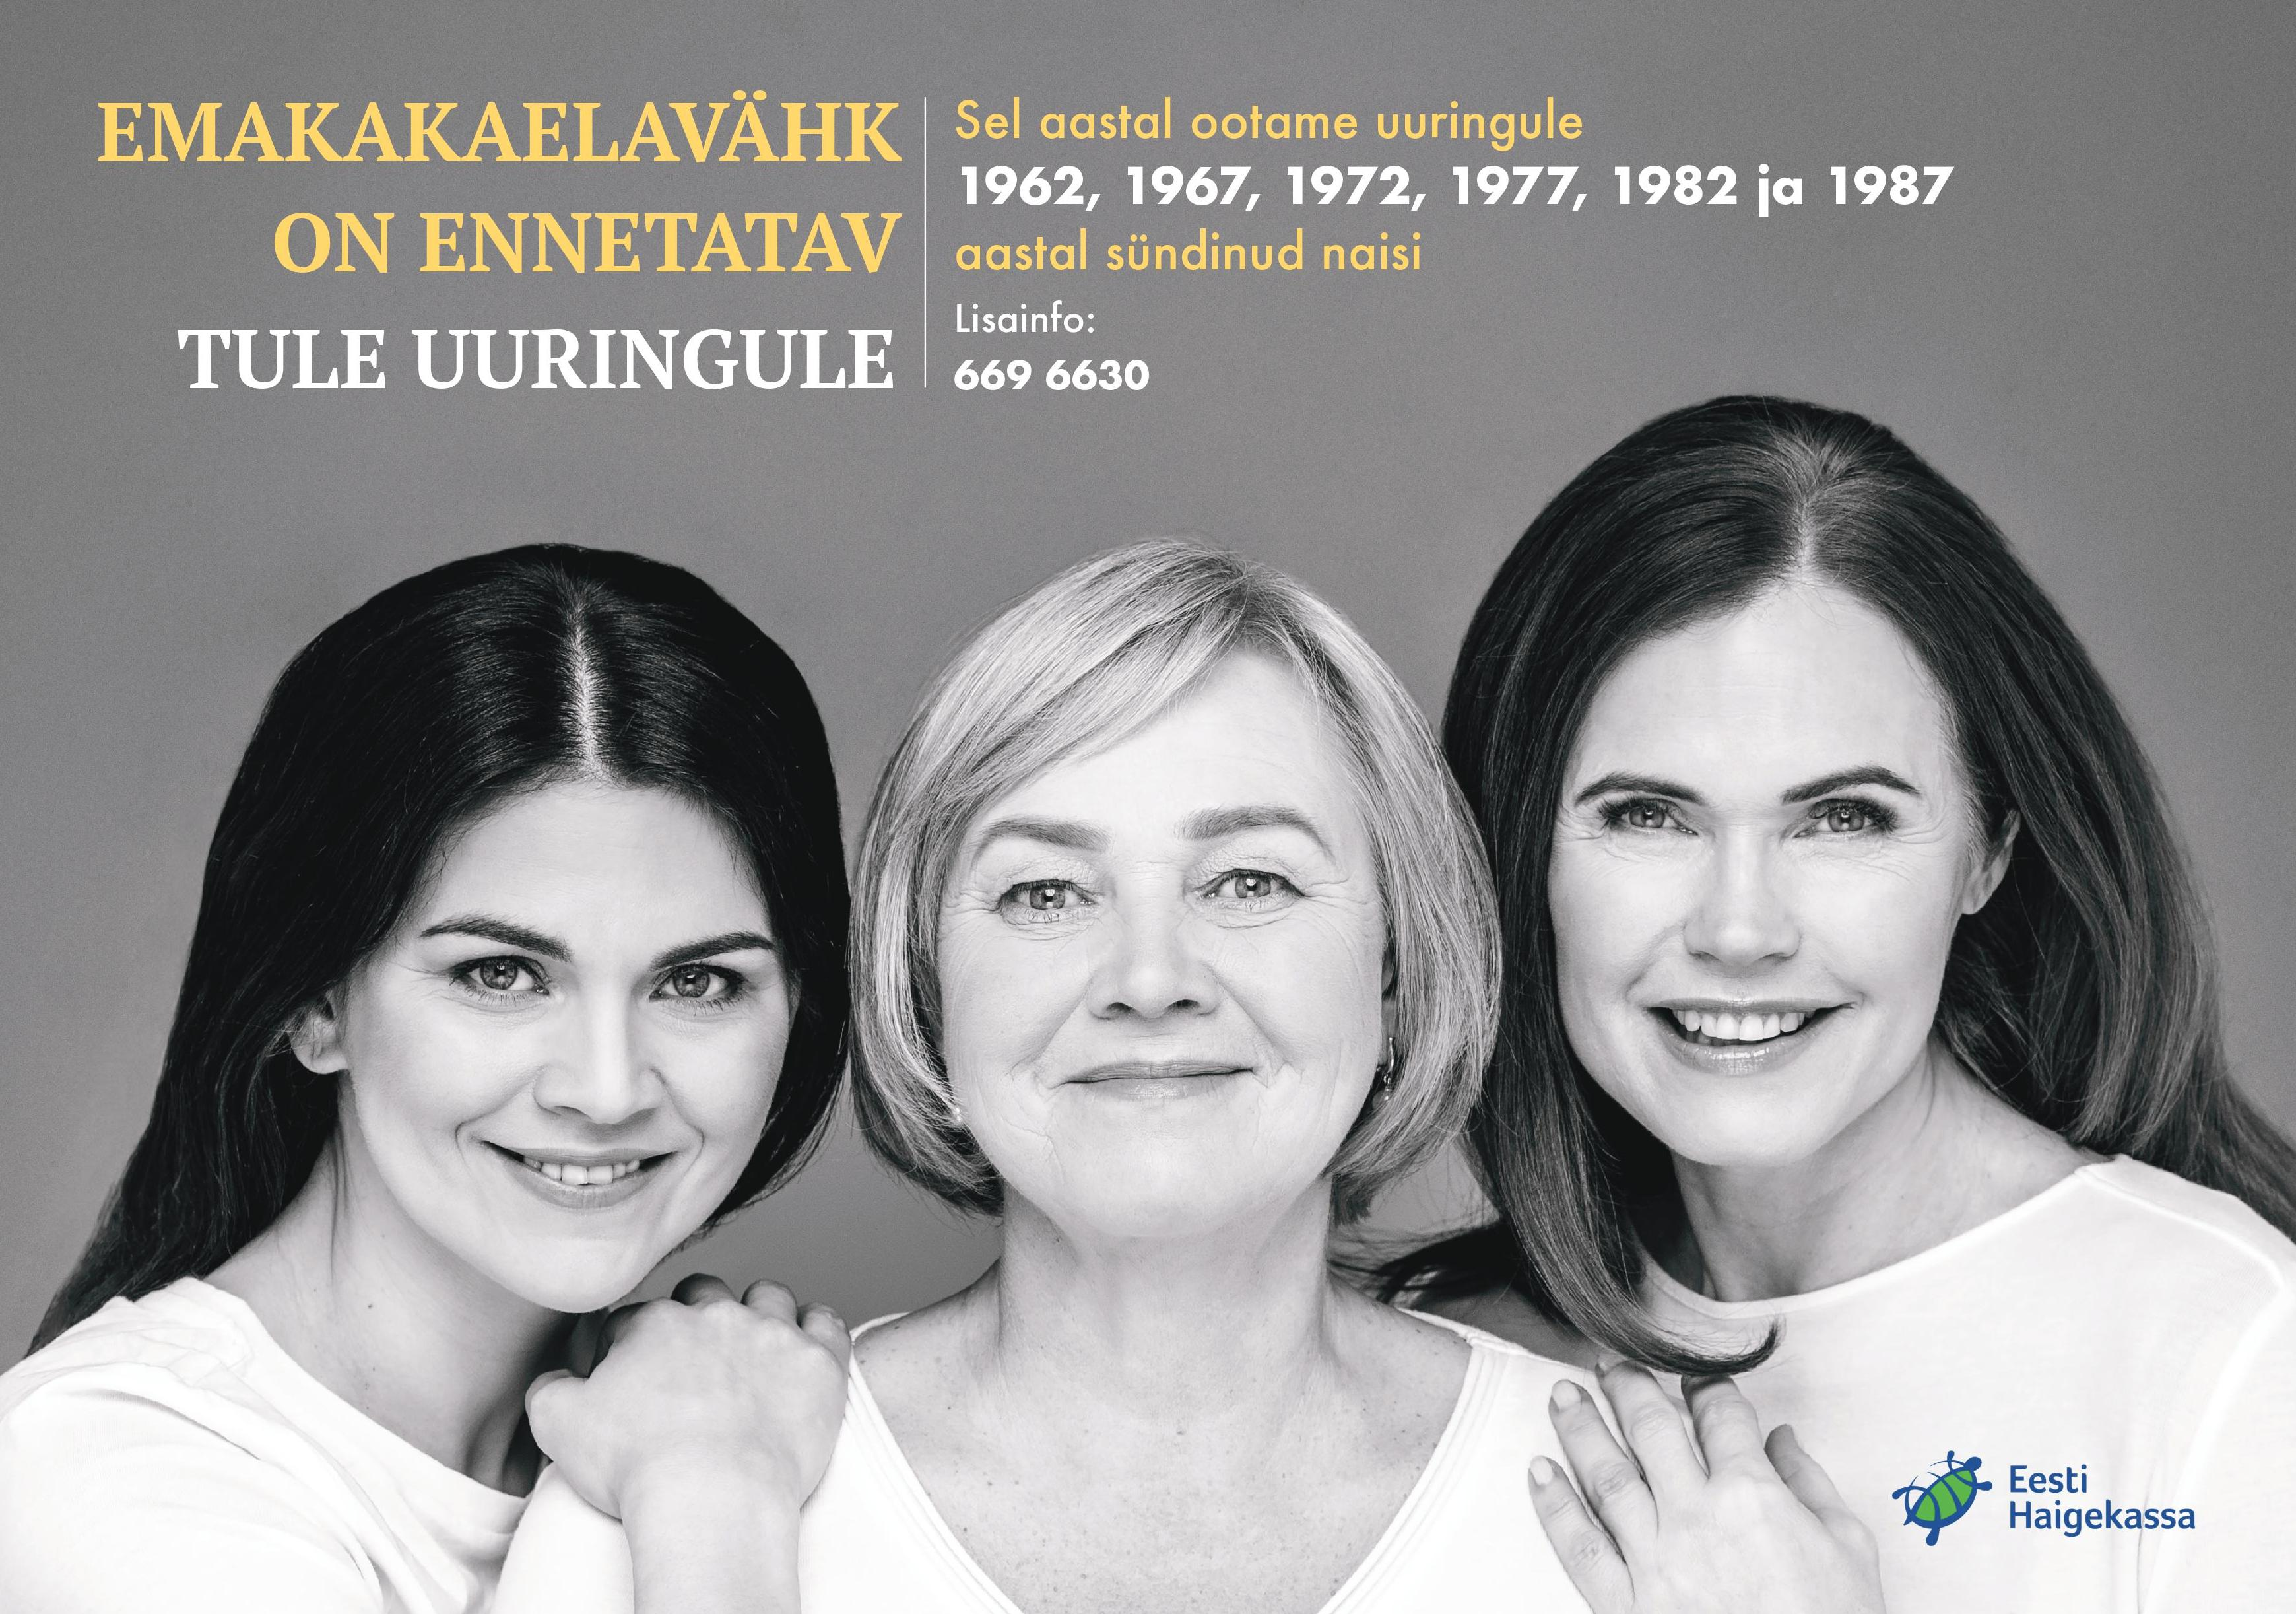 haigekassa_emakakaelavahk_soeluuring